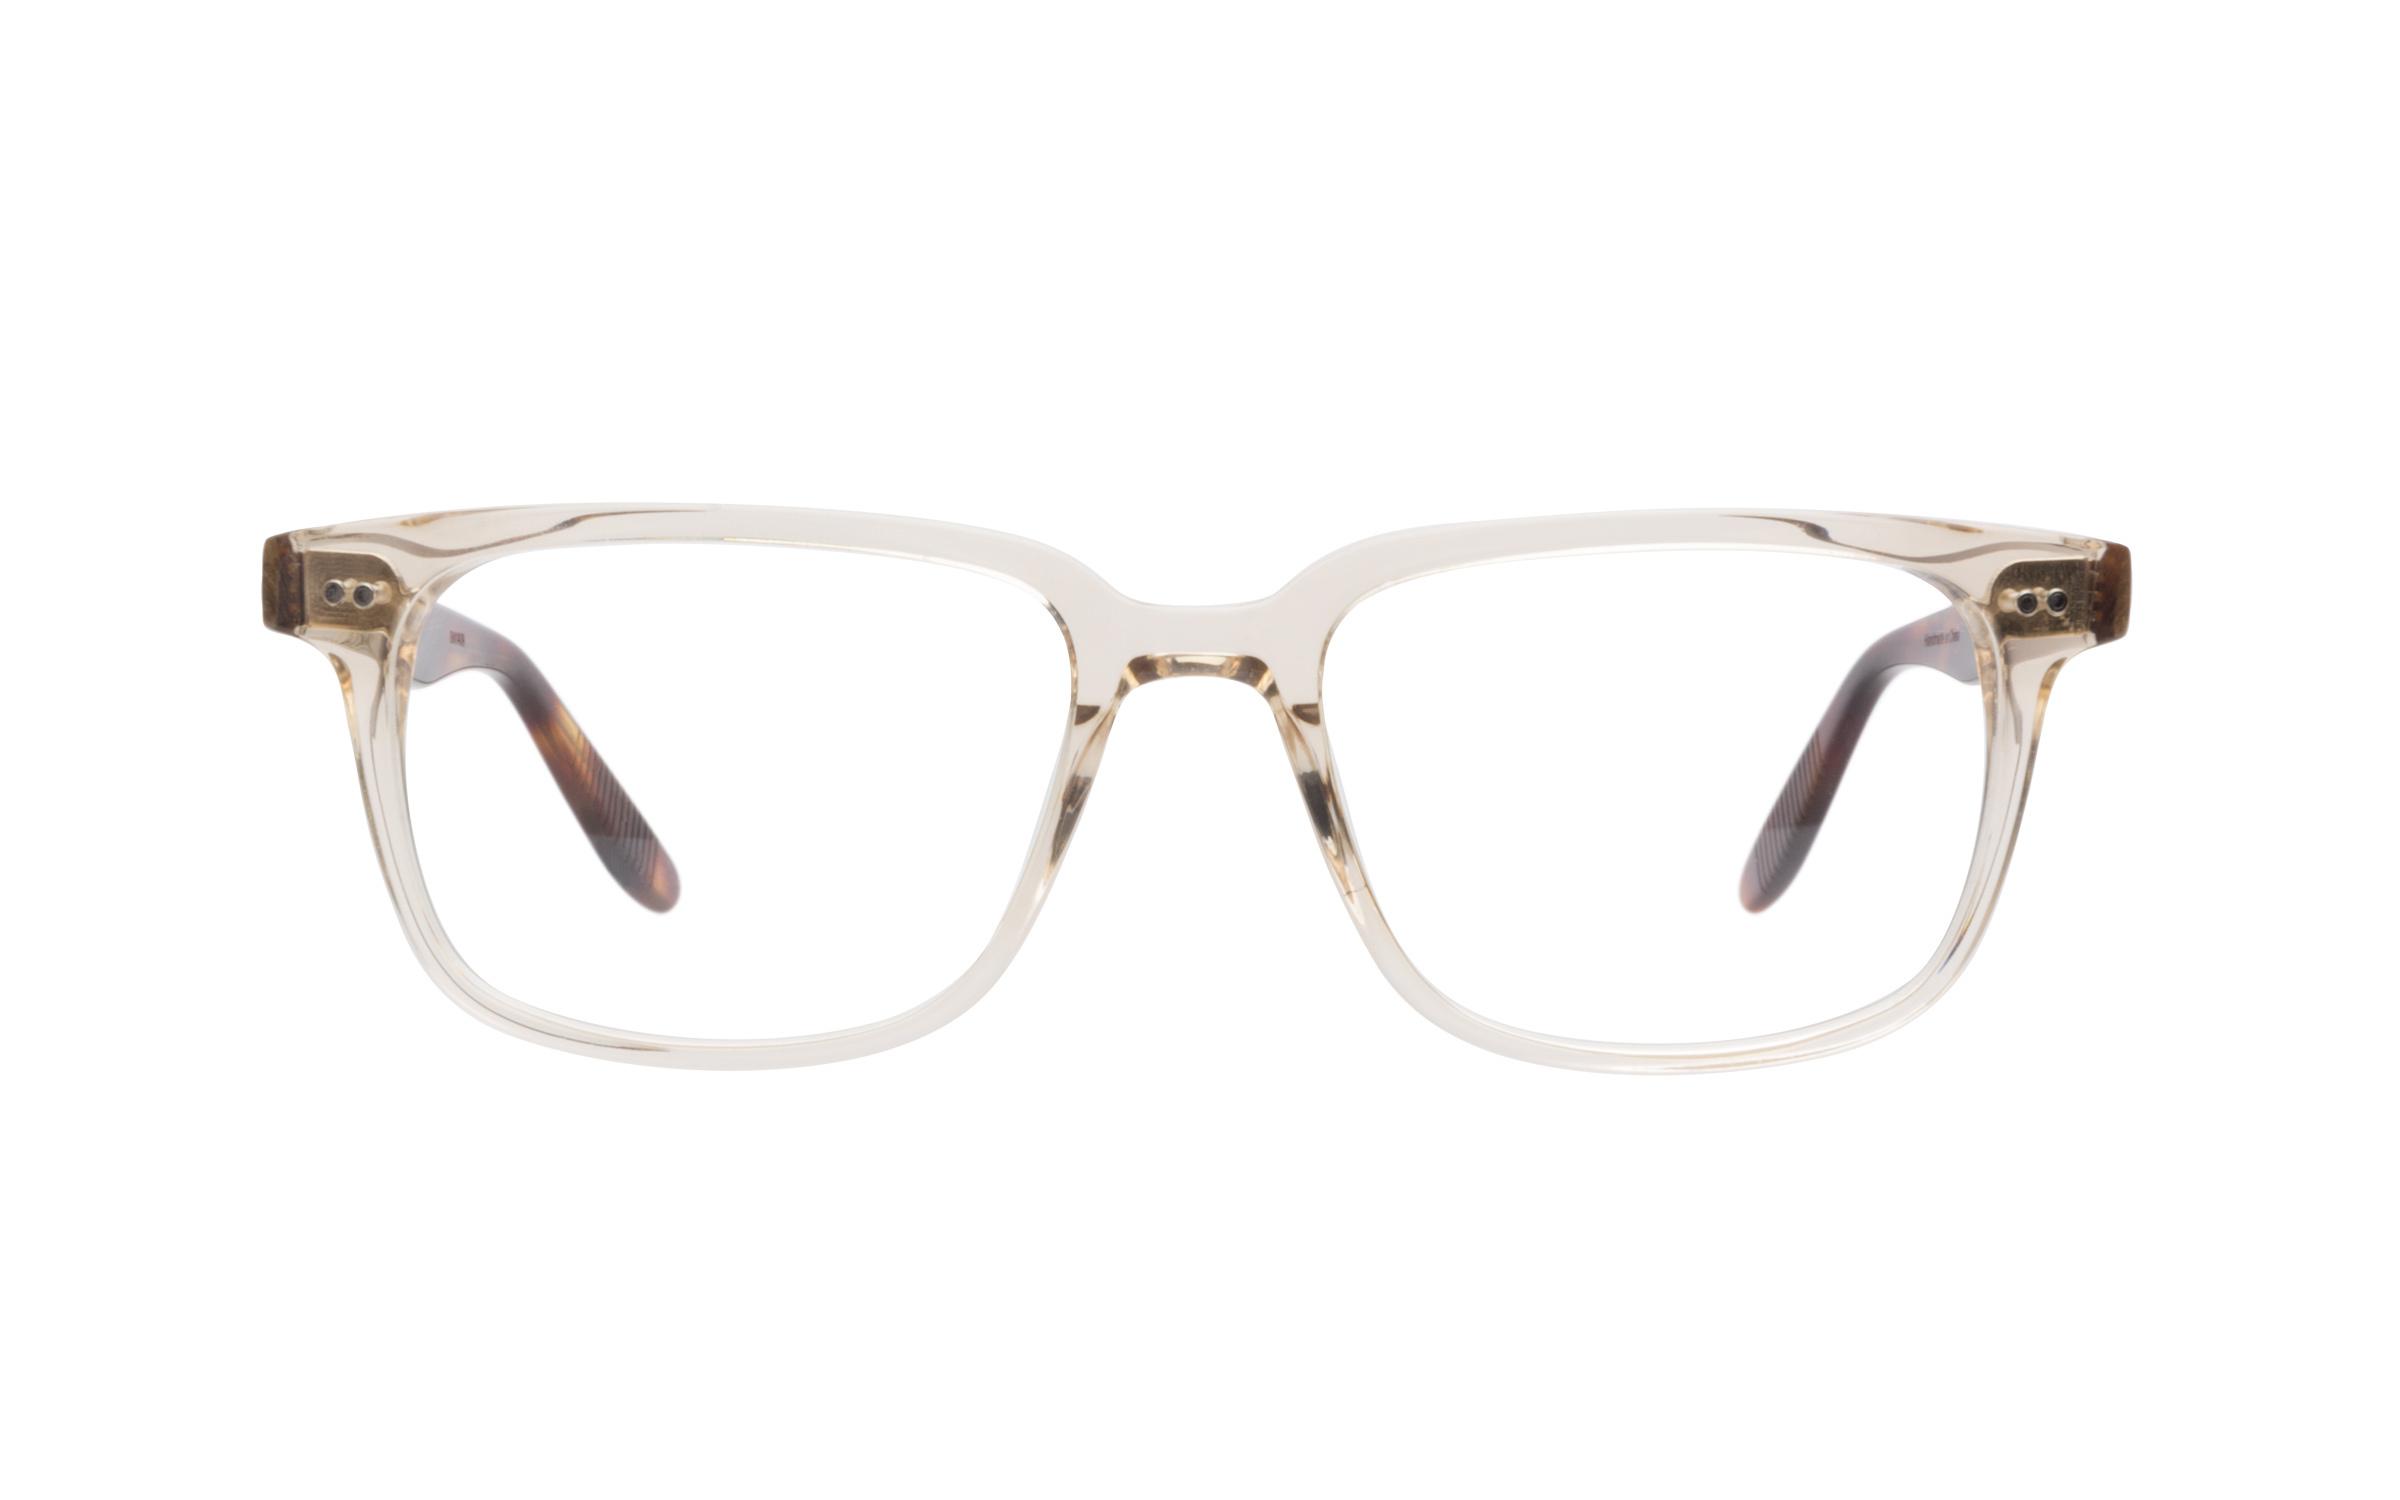 Joseph_Marc_Mens_Glasses_Vintage_Brown_Online_Coastal